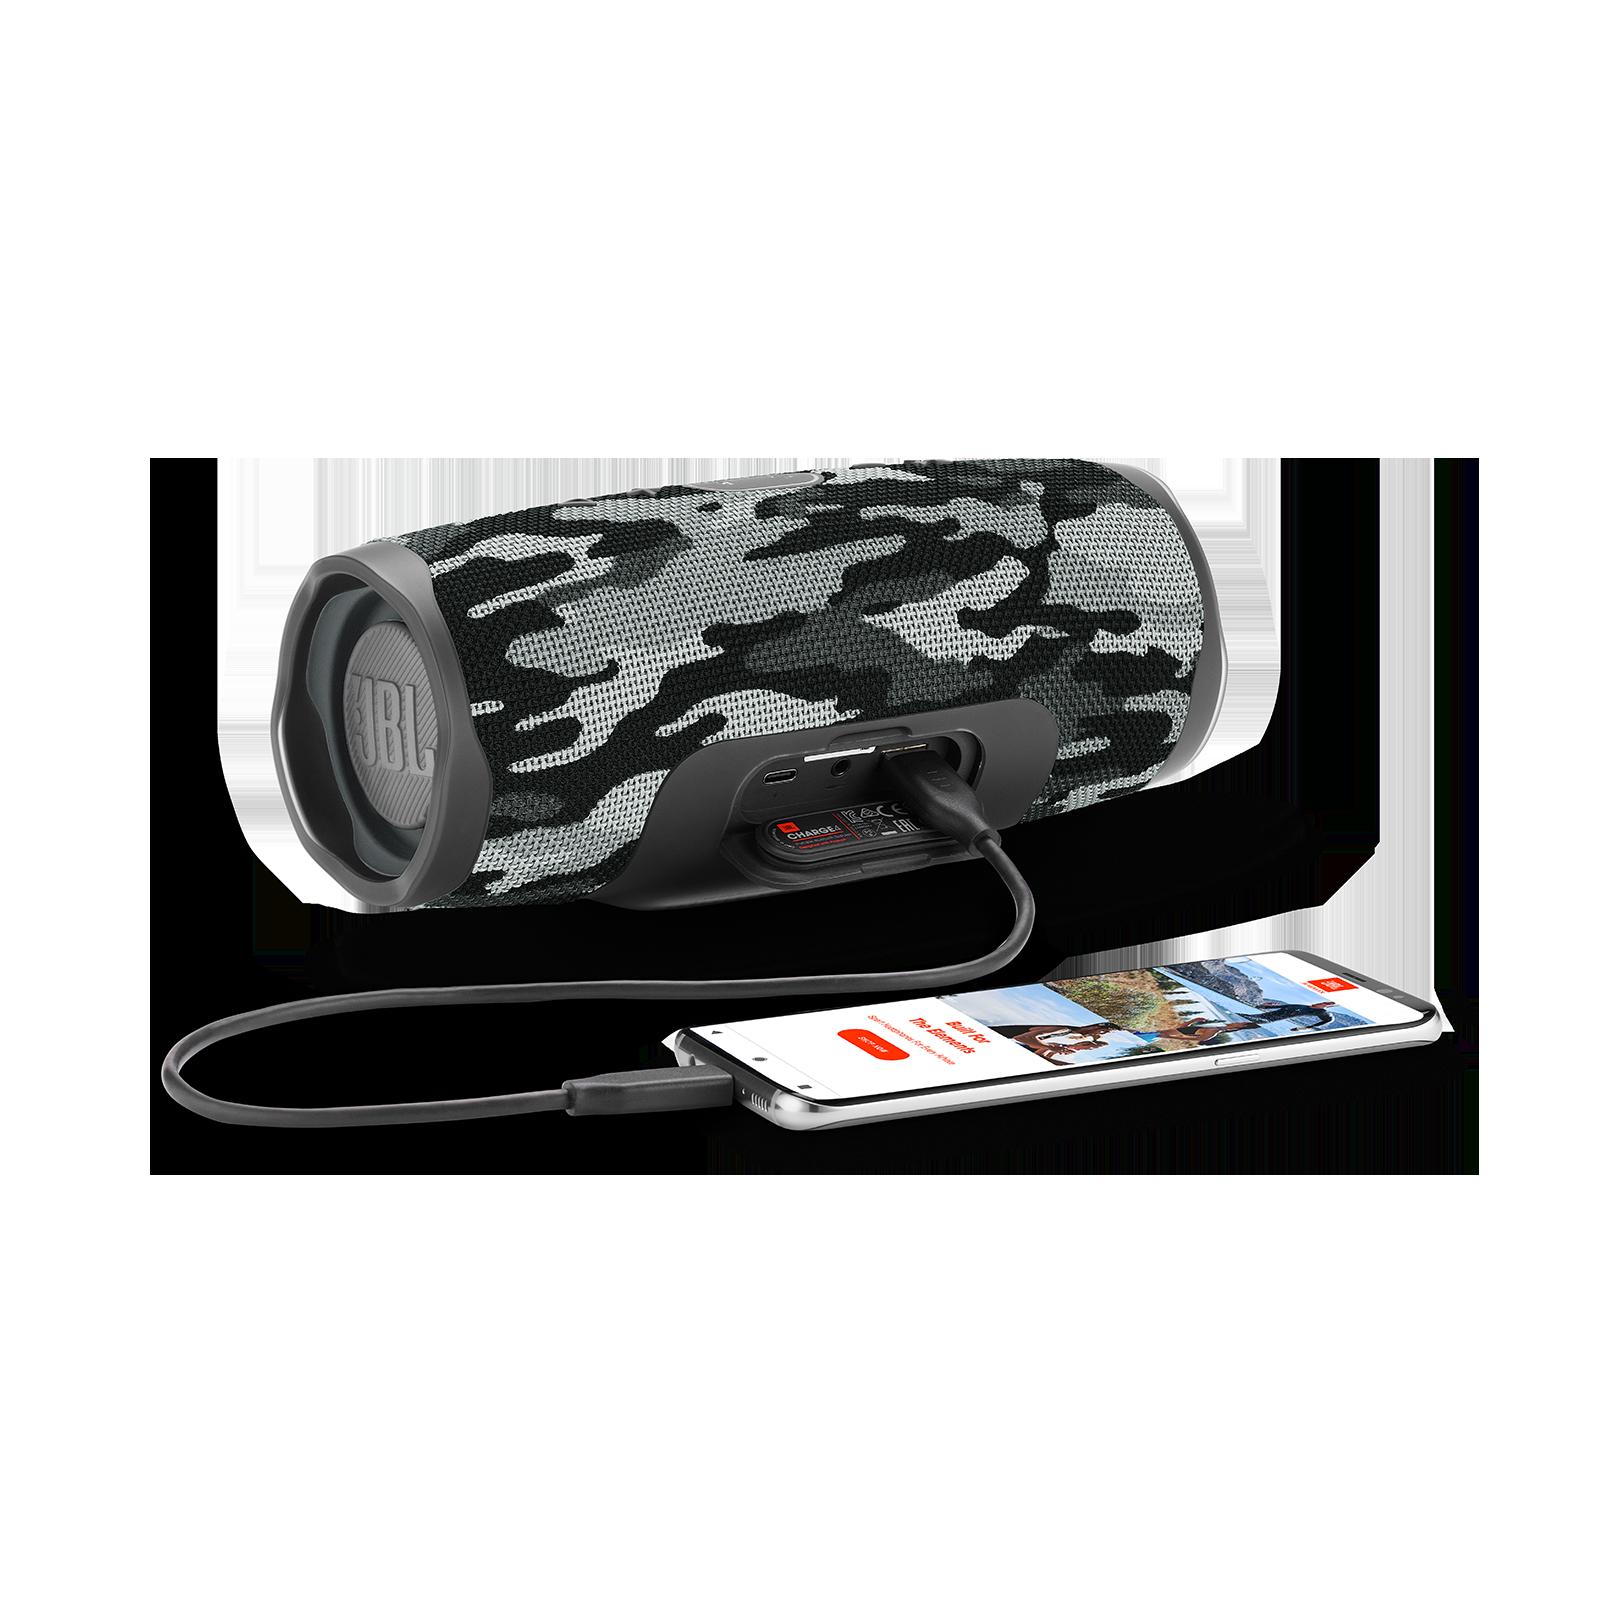 JBL Charge 4 - Black/White Camouflage - Portable Bluetooth speaker - Detailshot 4